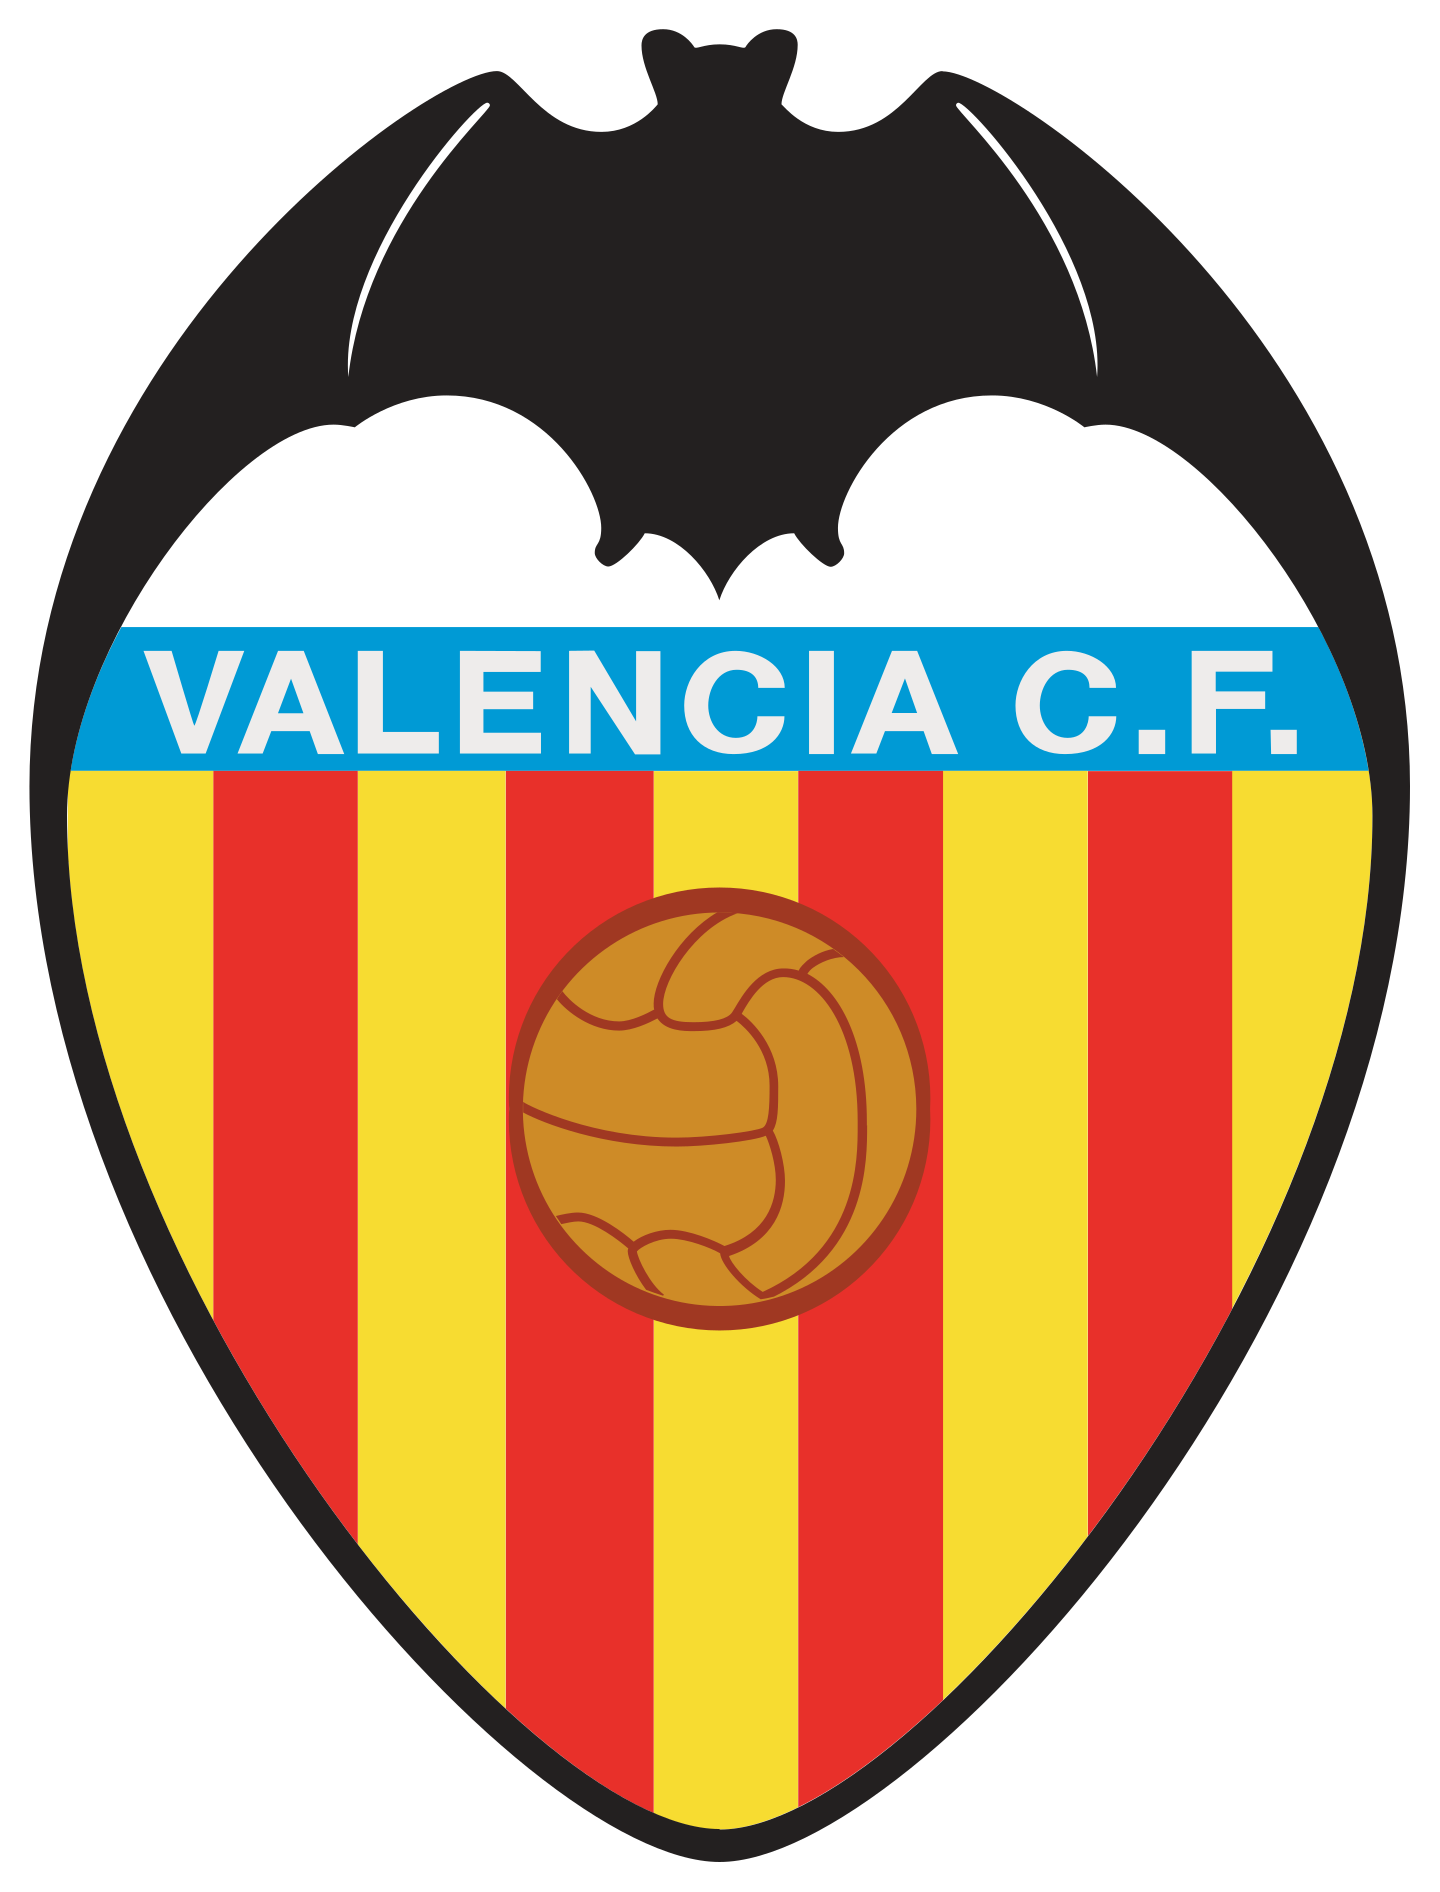 valencia cf logo escudo 2 - Valencia CF Logo - Escudo